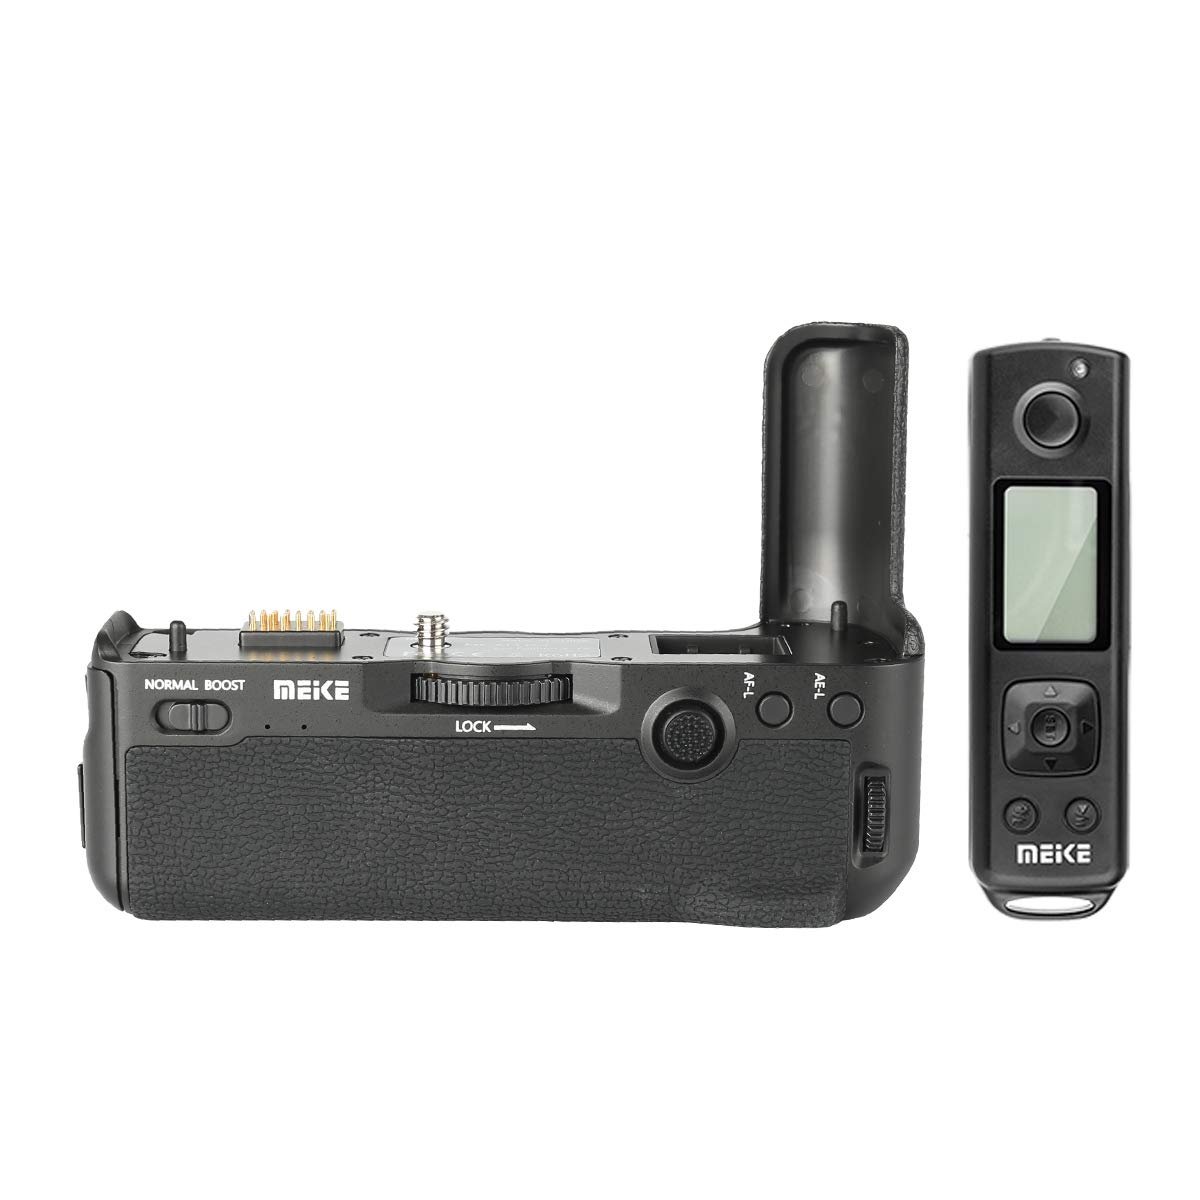 Mando a Distancia inal/ámbrico para Fujifilm X-T3 2,4 G, 100 m Meike MK-XT3 Pro